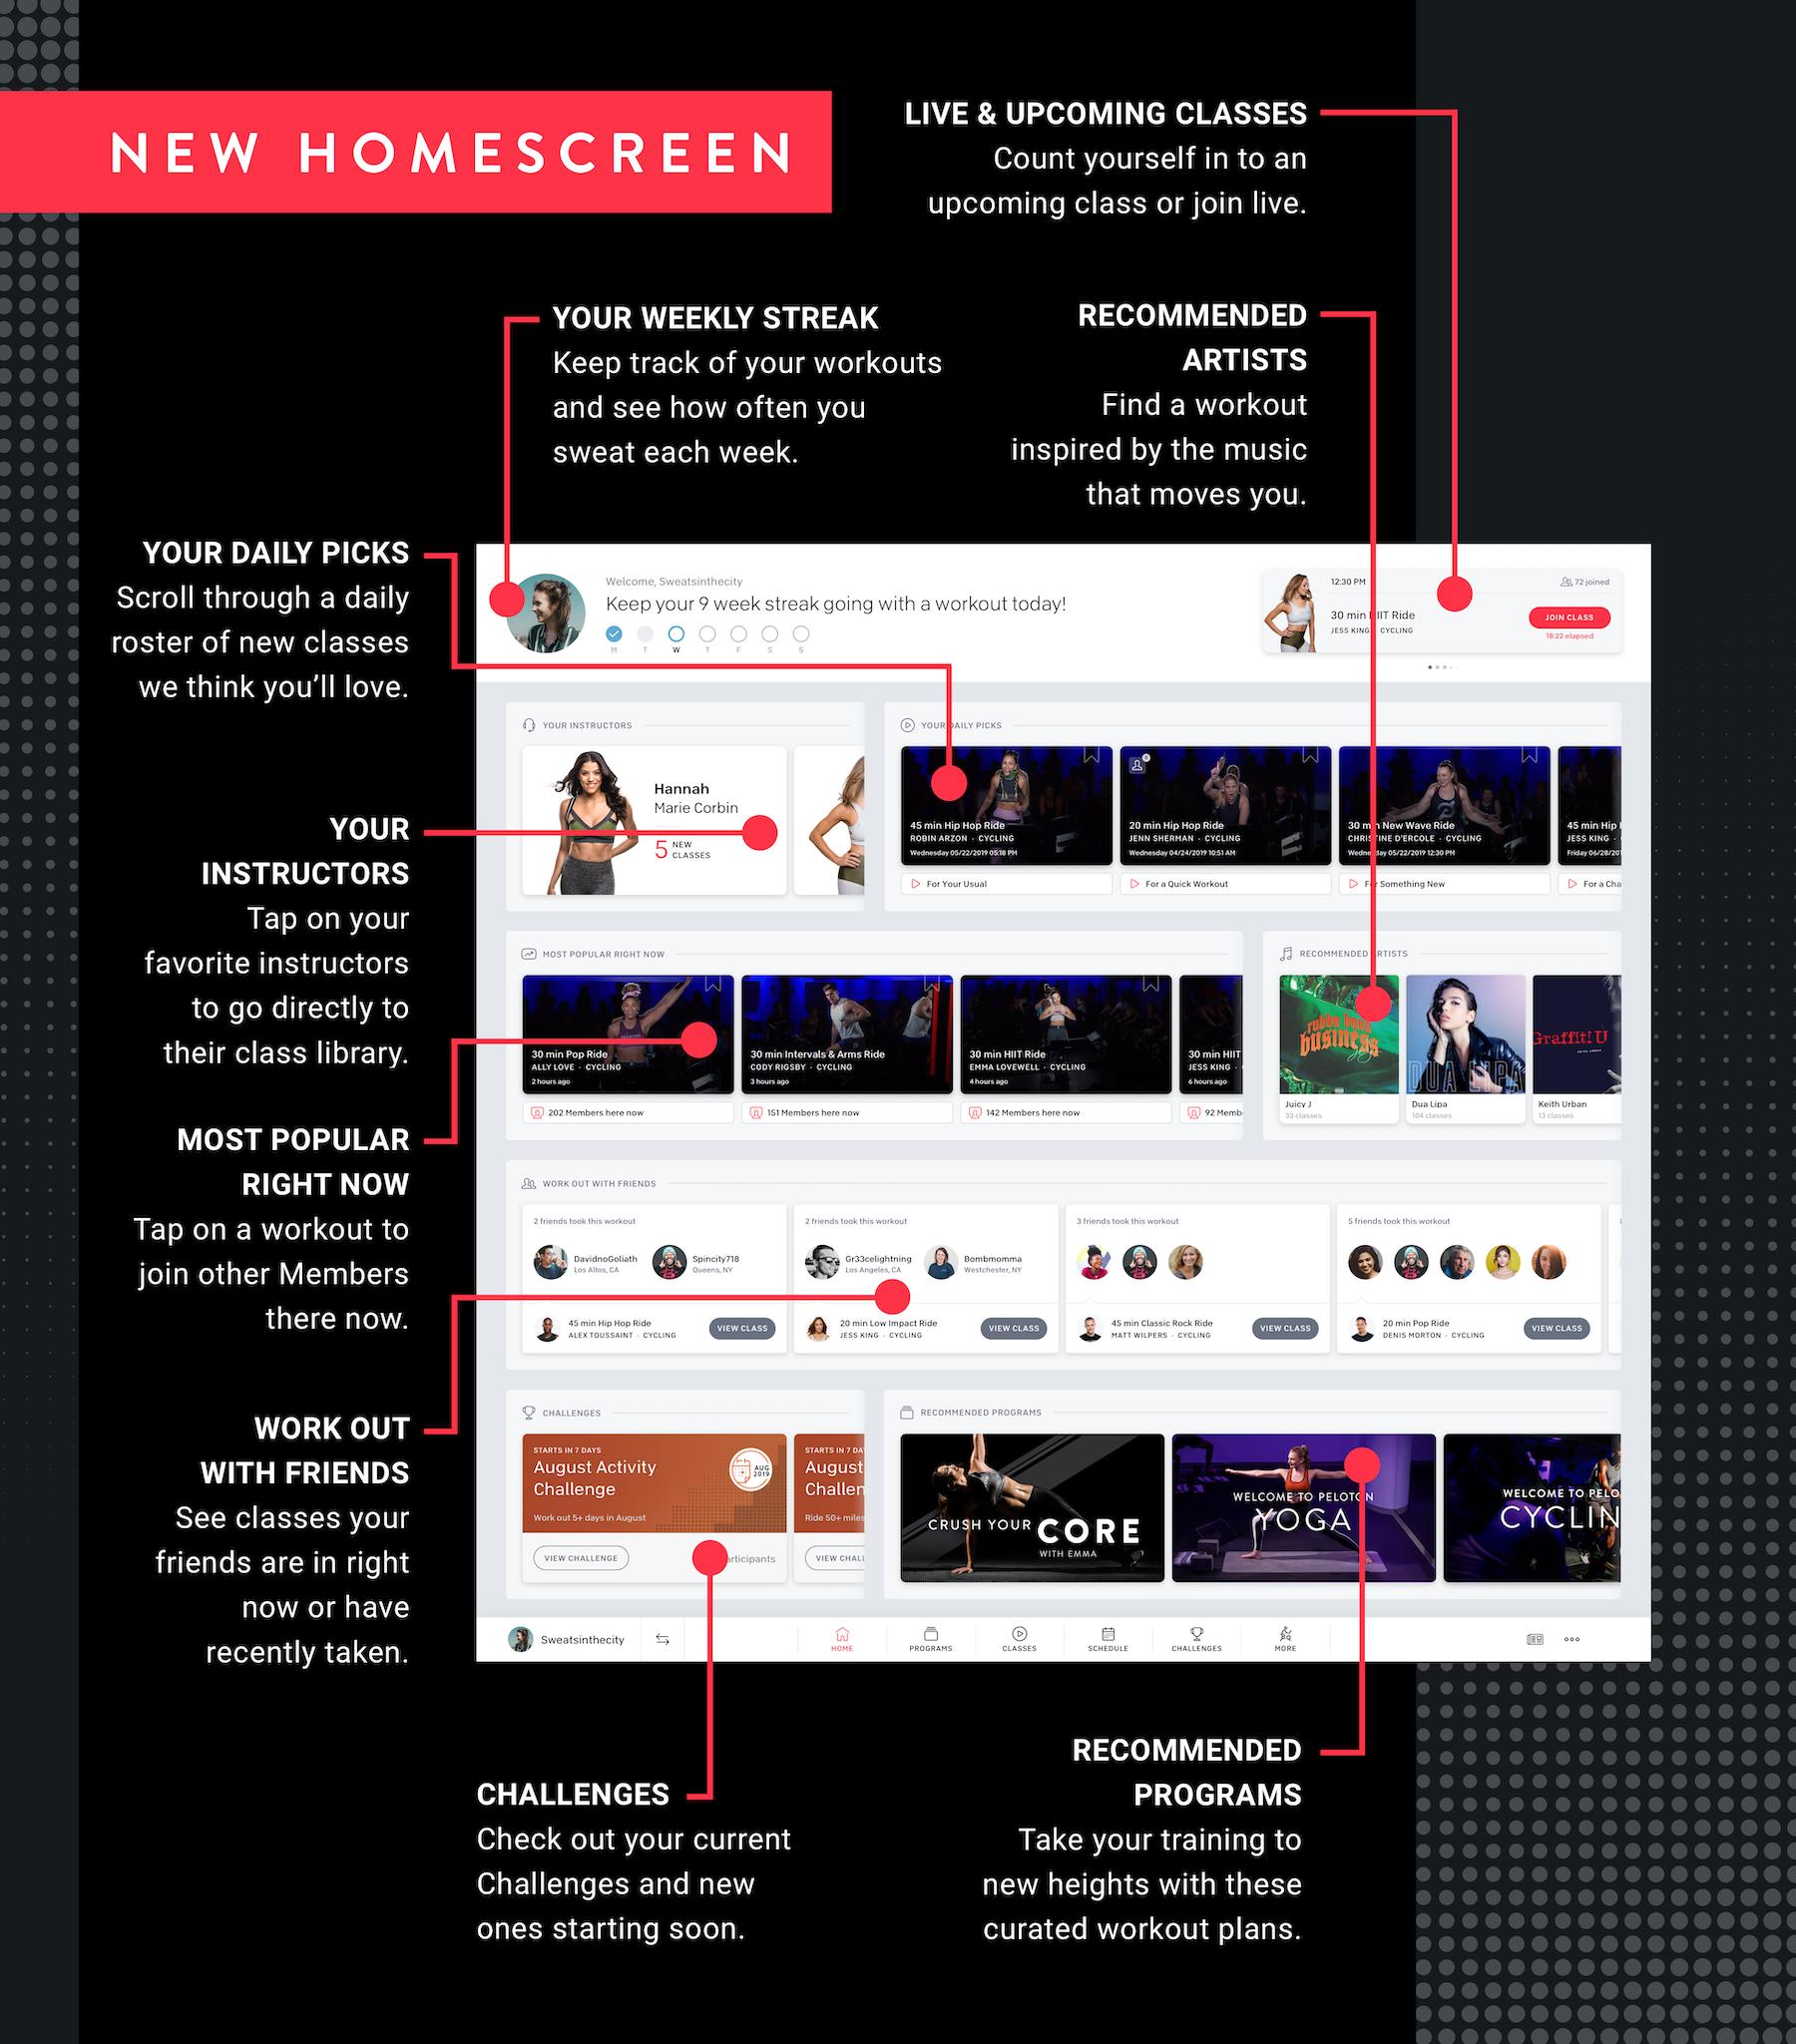 peloton new home screen layout